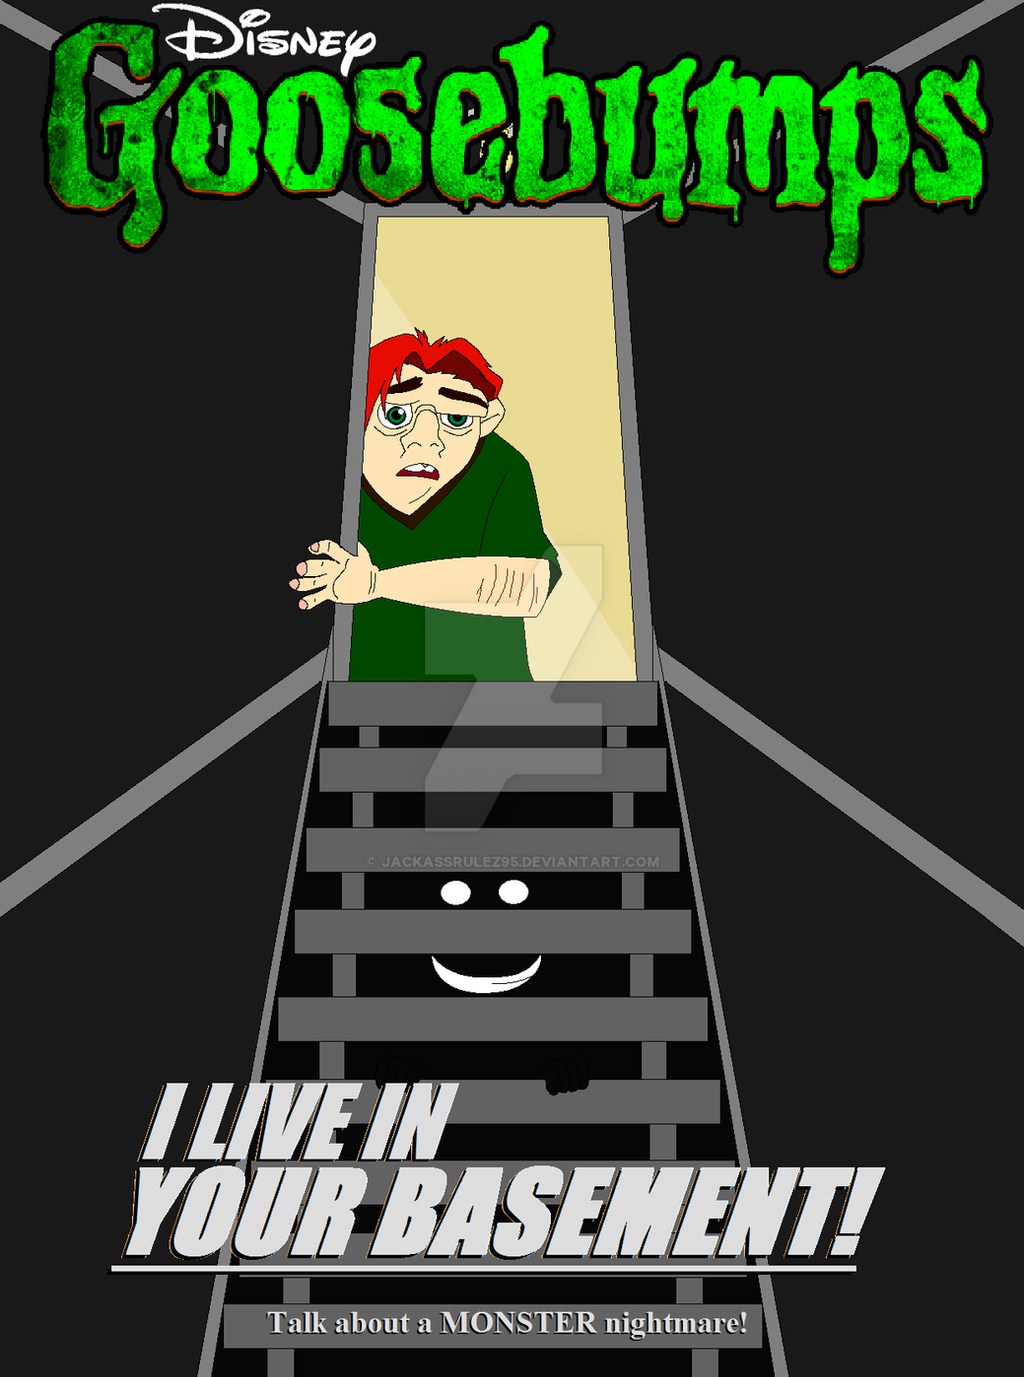 disney 39 s goosebumps i live in your basement by jackassrulez95 on